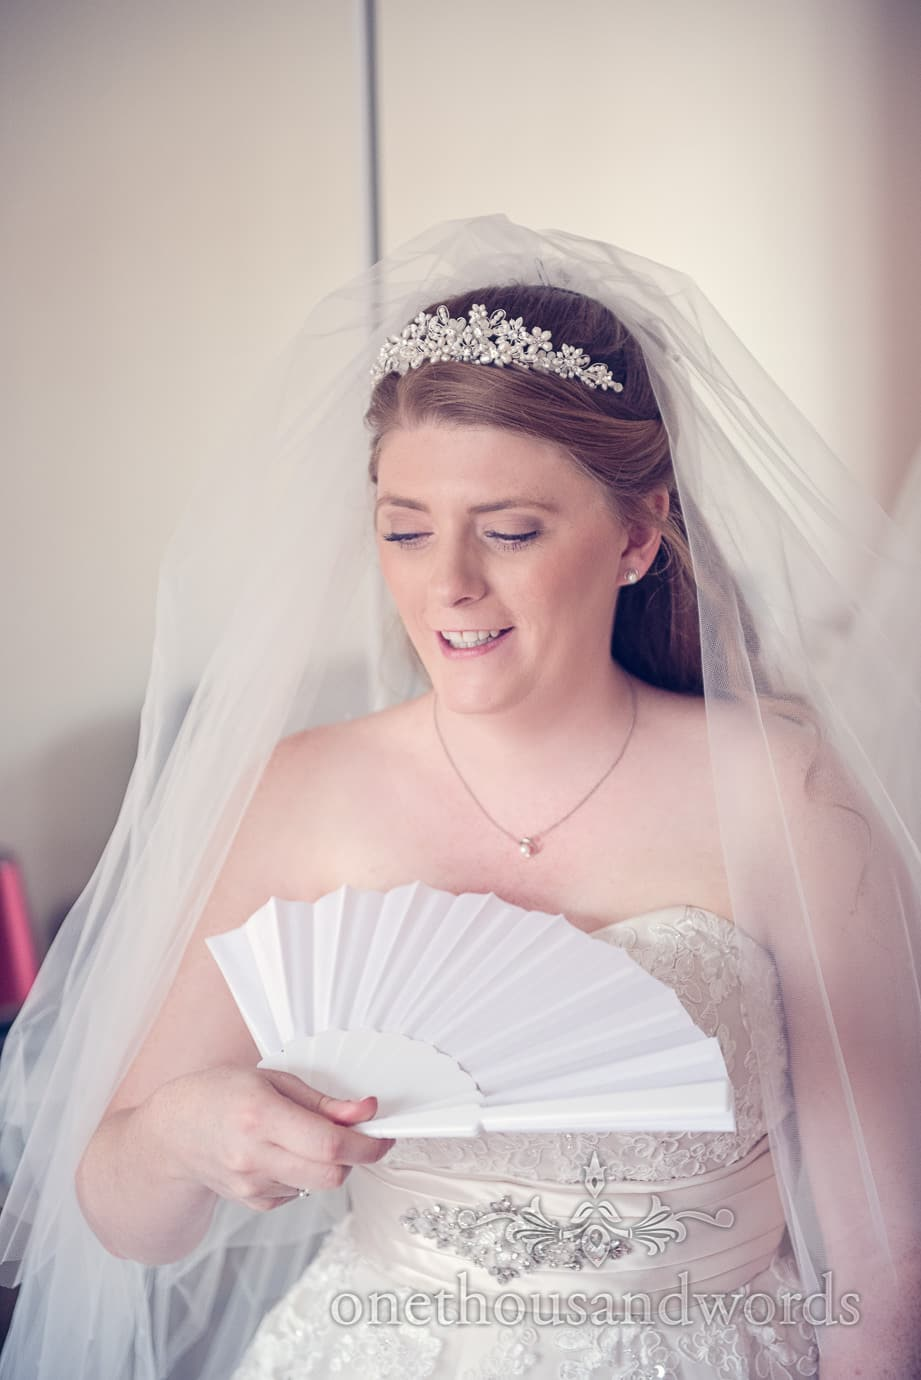 Bride in tiara and veil uses white wedding fan on Dorset wedding morning